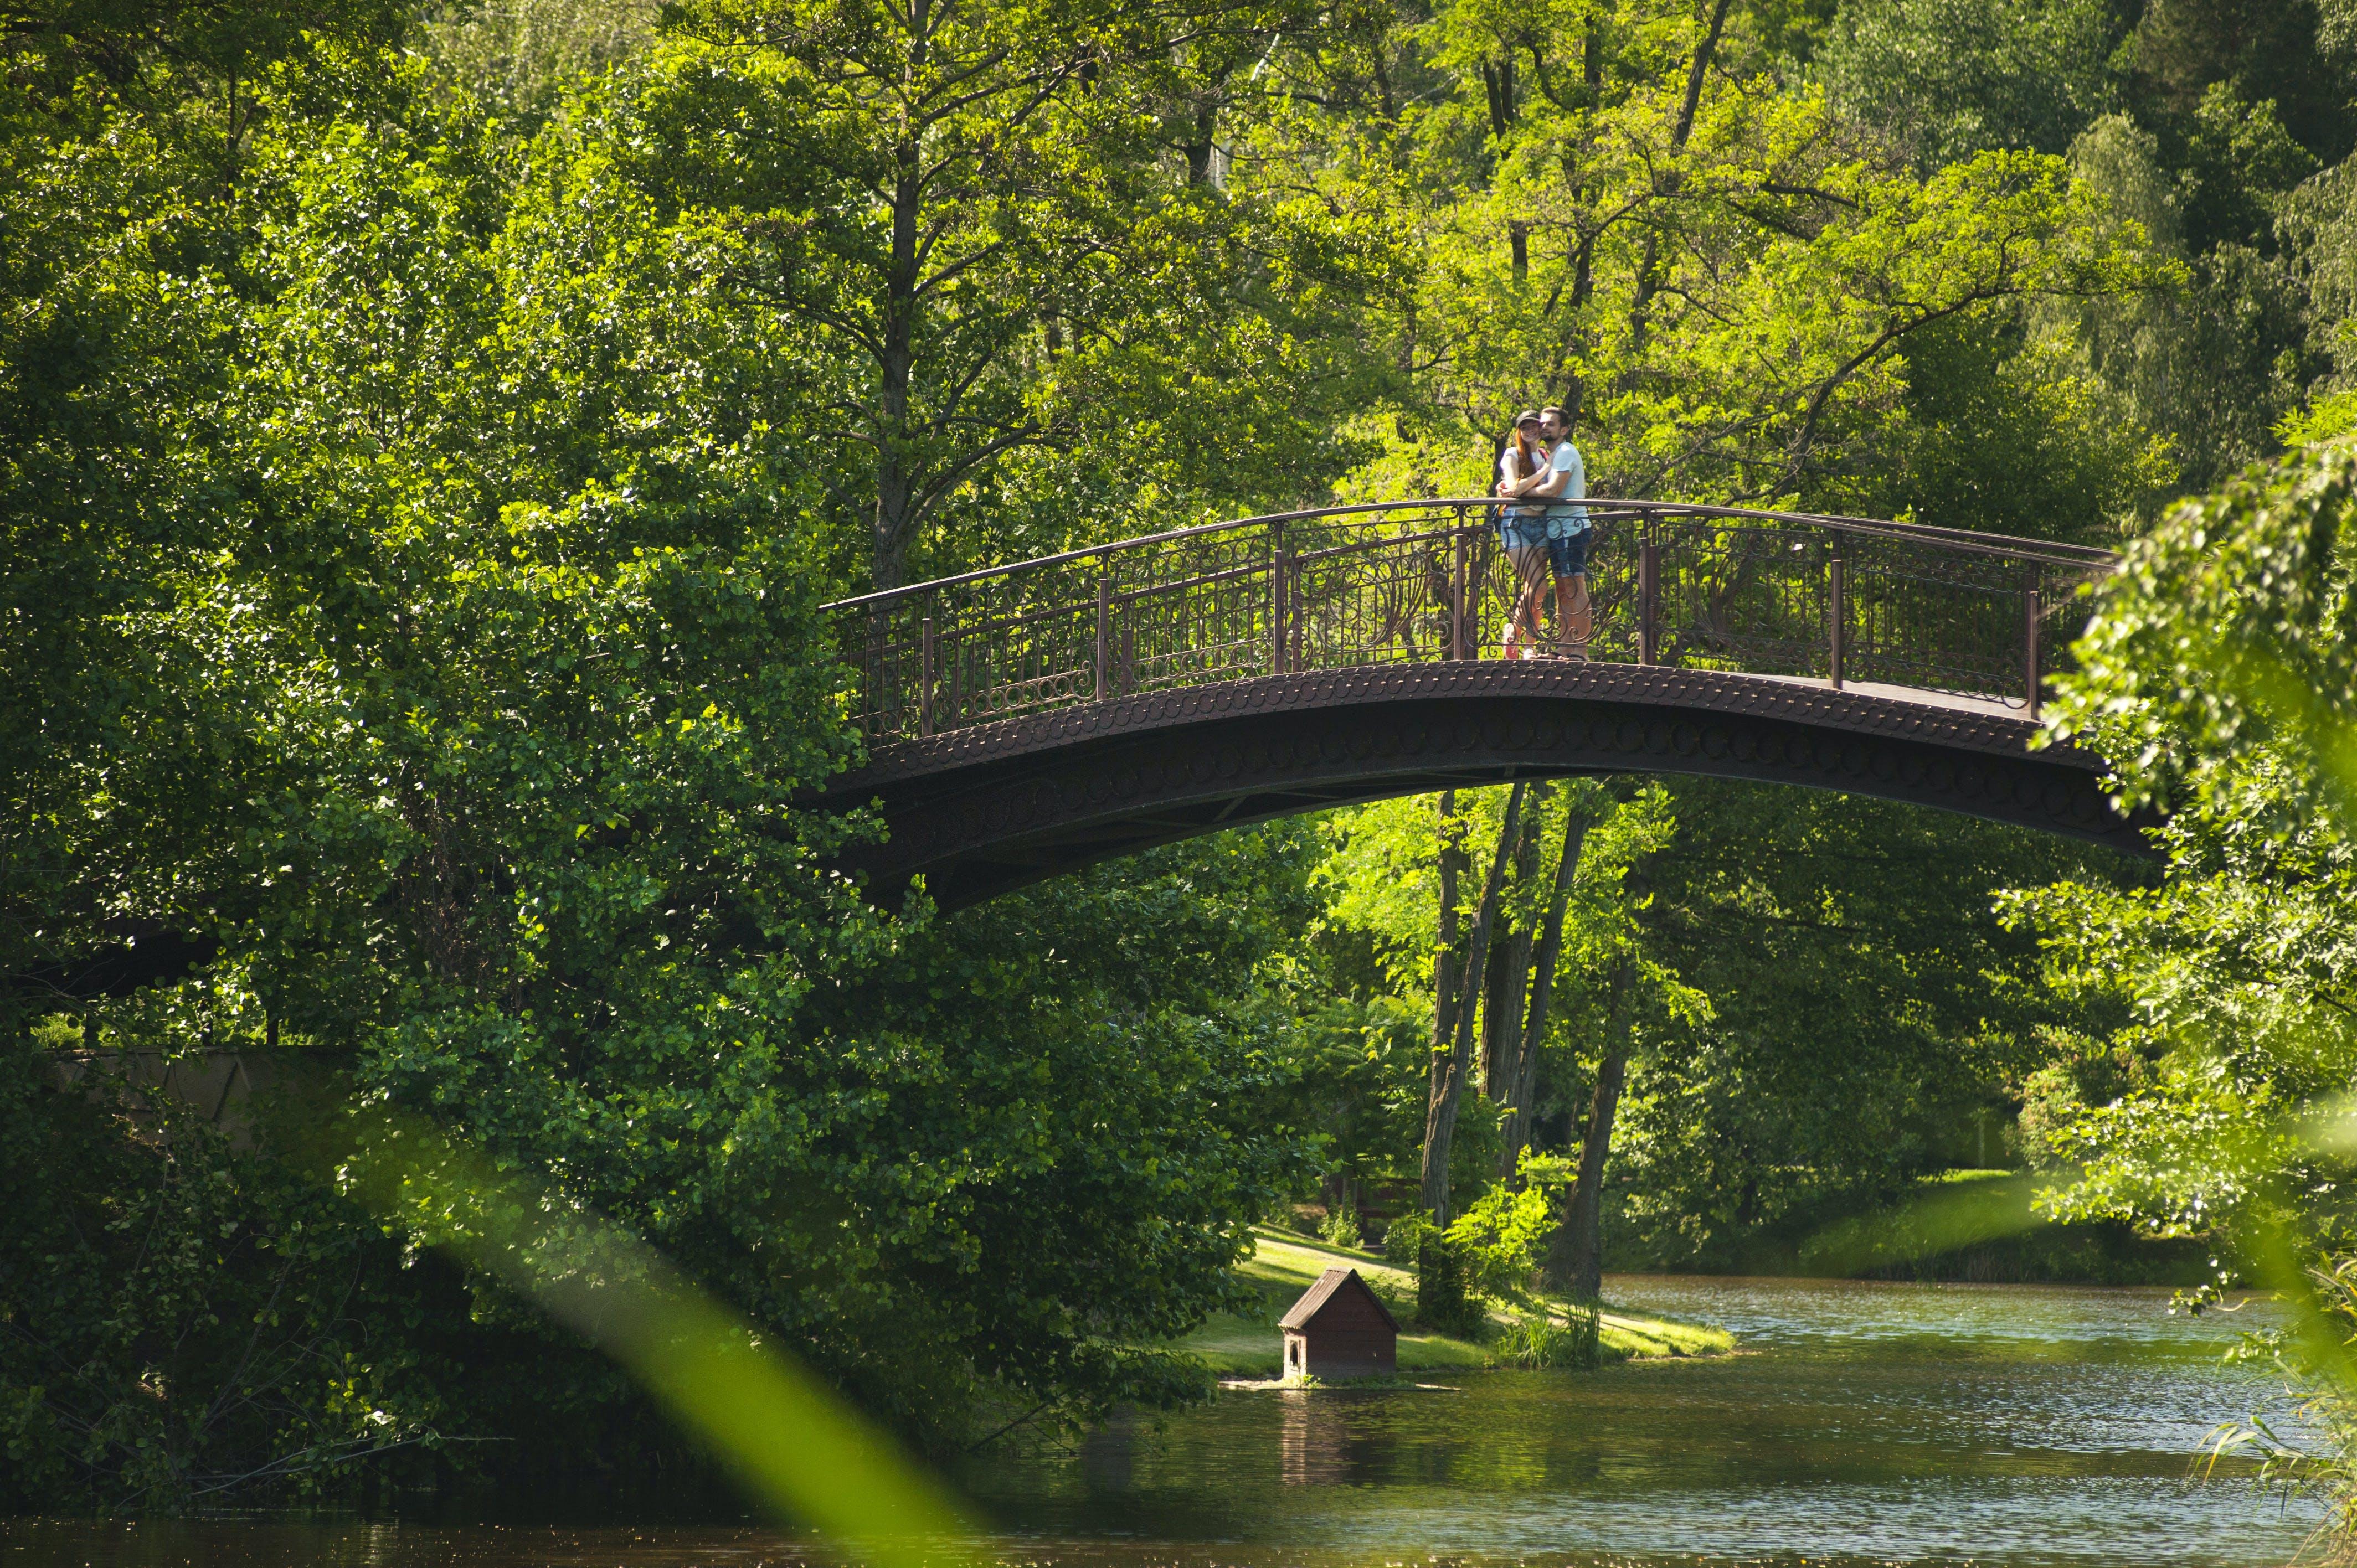 Photo of Couple Hugging on Bridge over River